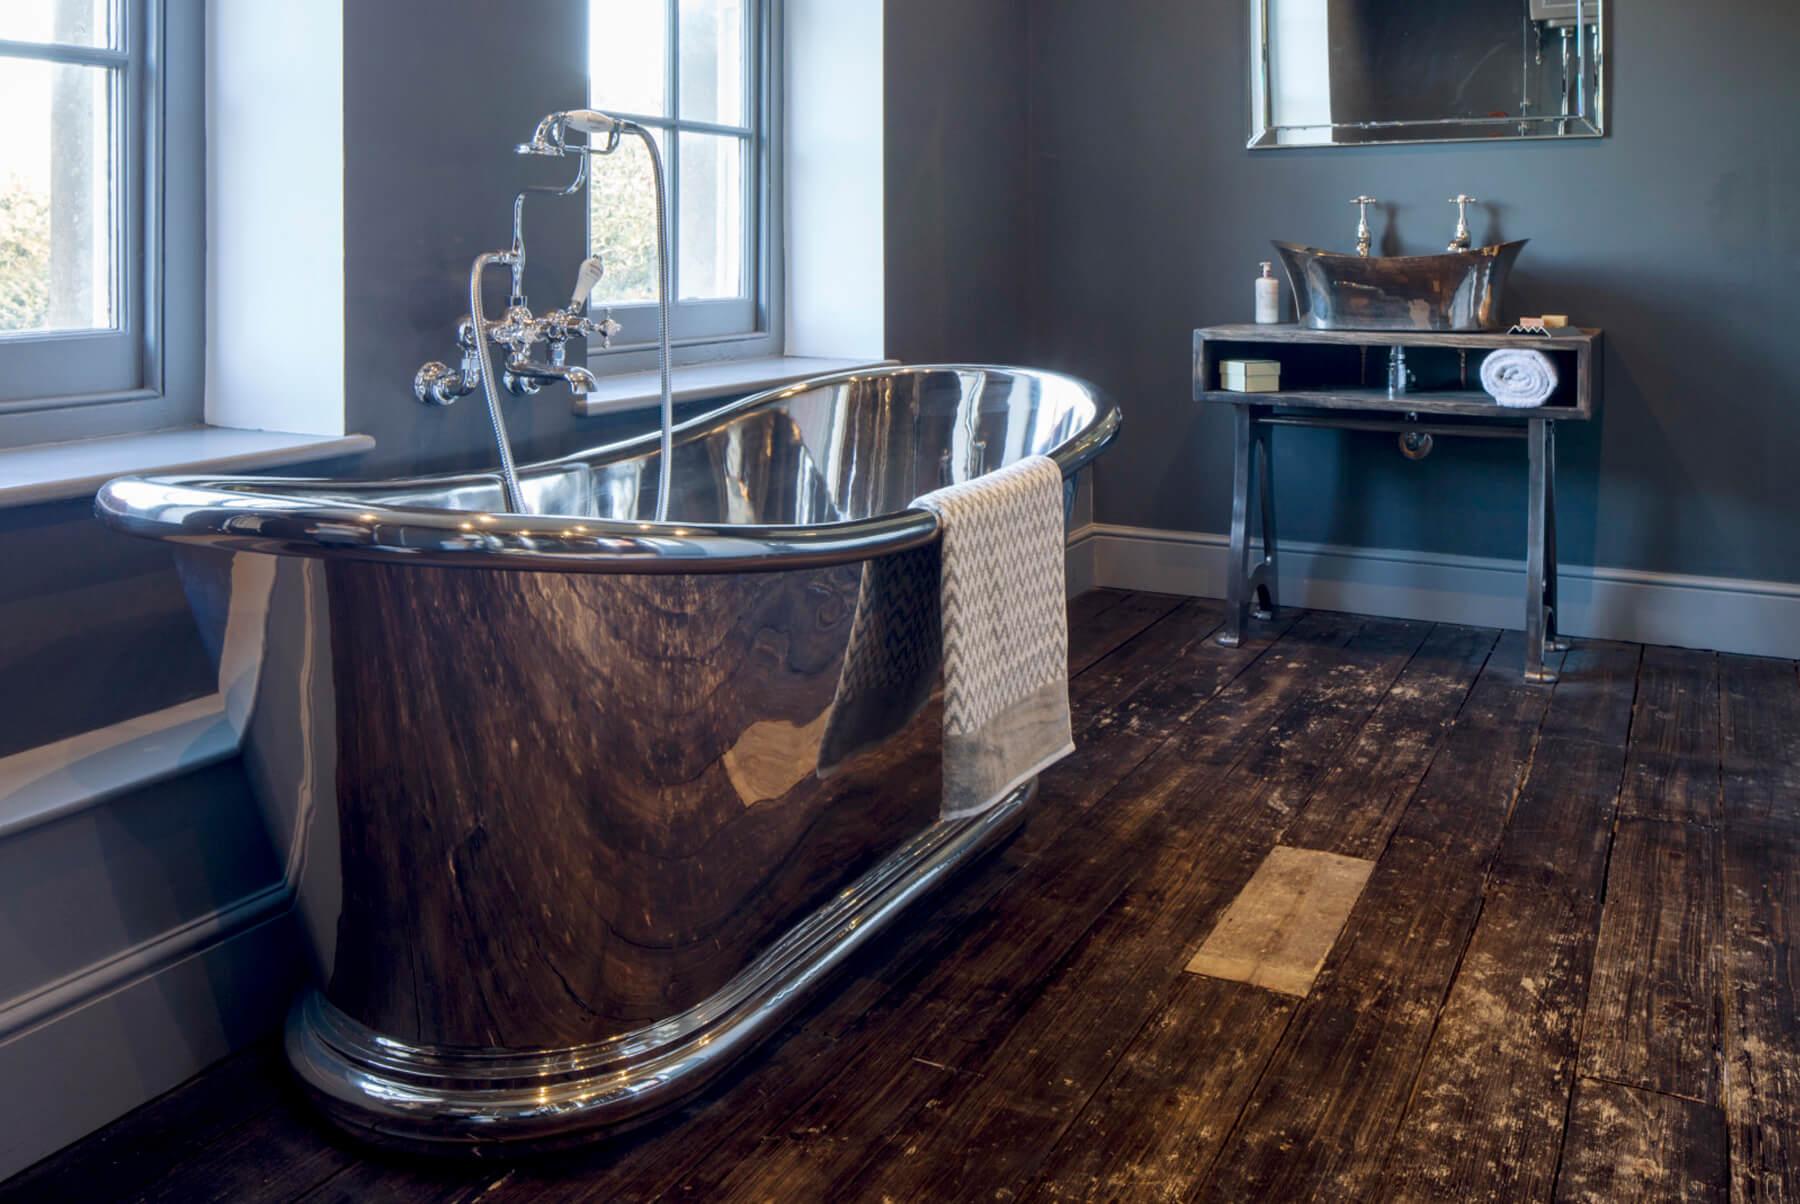 Bath-Tubs-HURLINGHAM-BULLE-NICKEL-MAIN-1800x1204